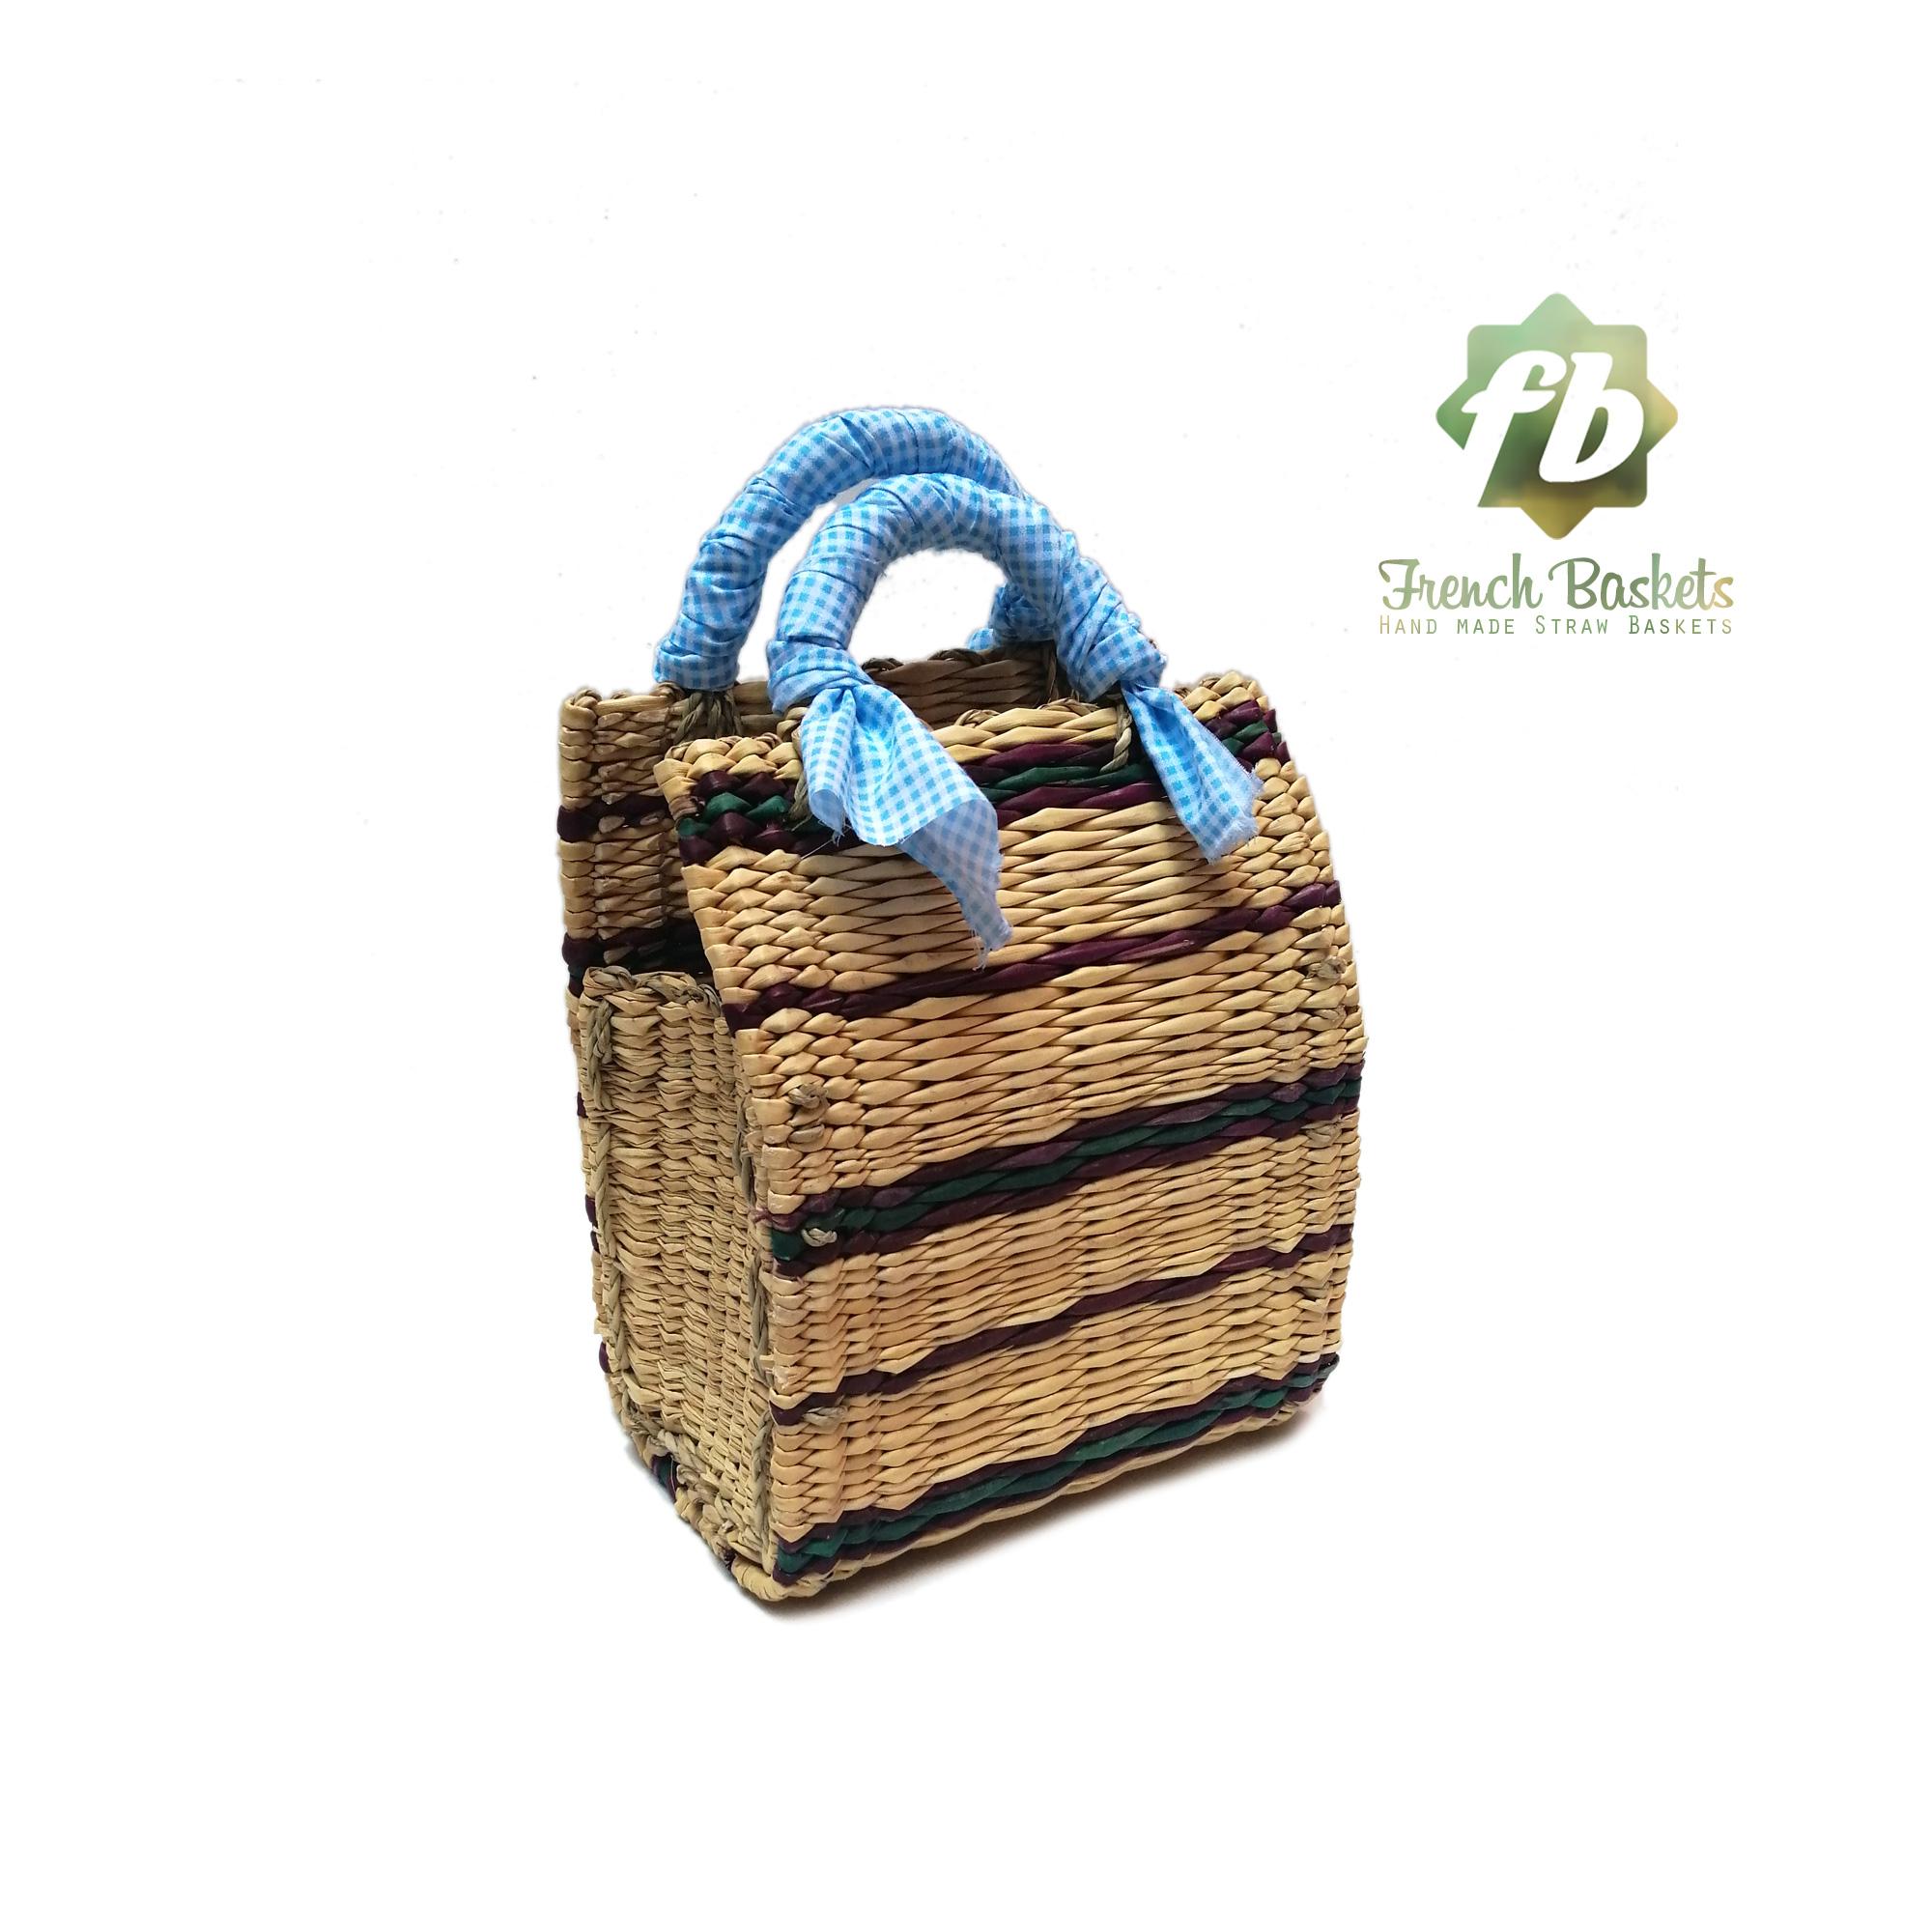 Straw handbag french baskets sky blue